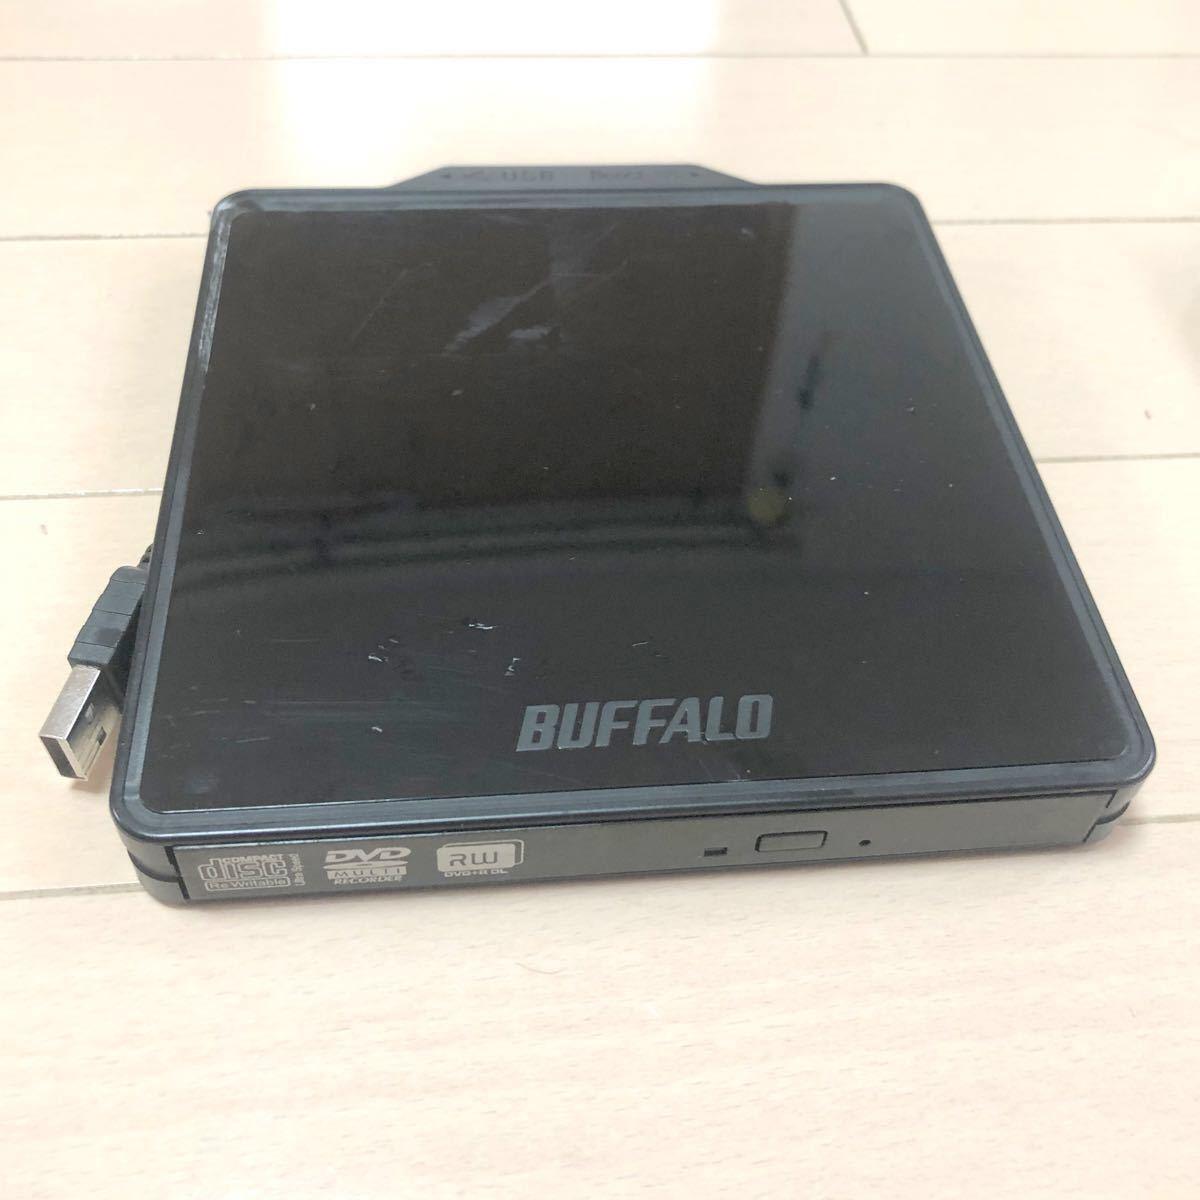 ●BUFFALO  外付け DVDドライブ動作品2         DVSM-PC58U2V-BK マルチドライブ